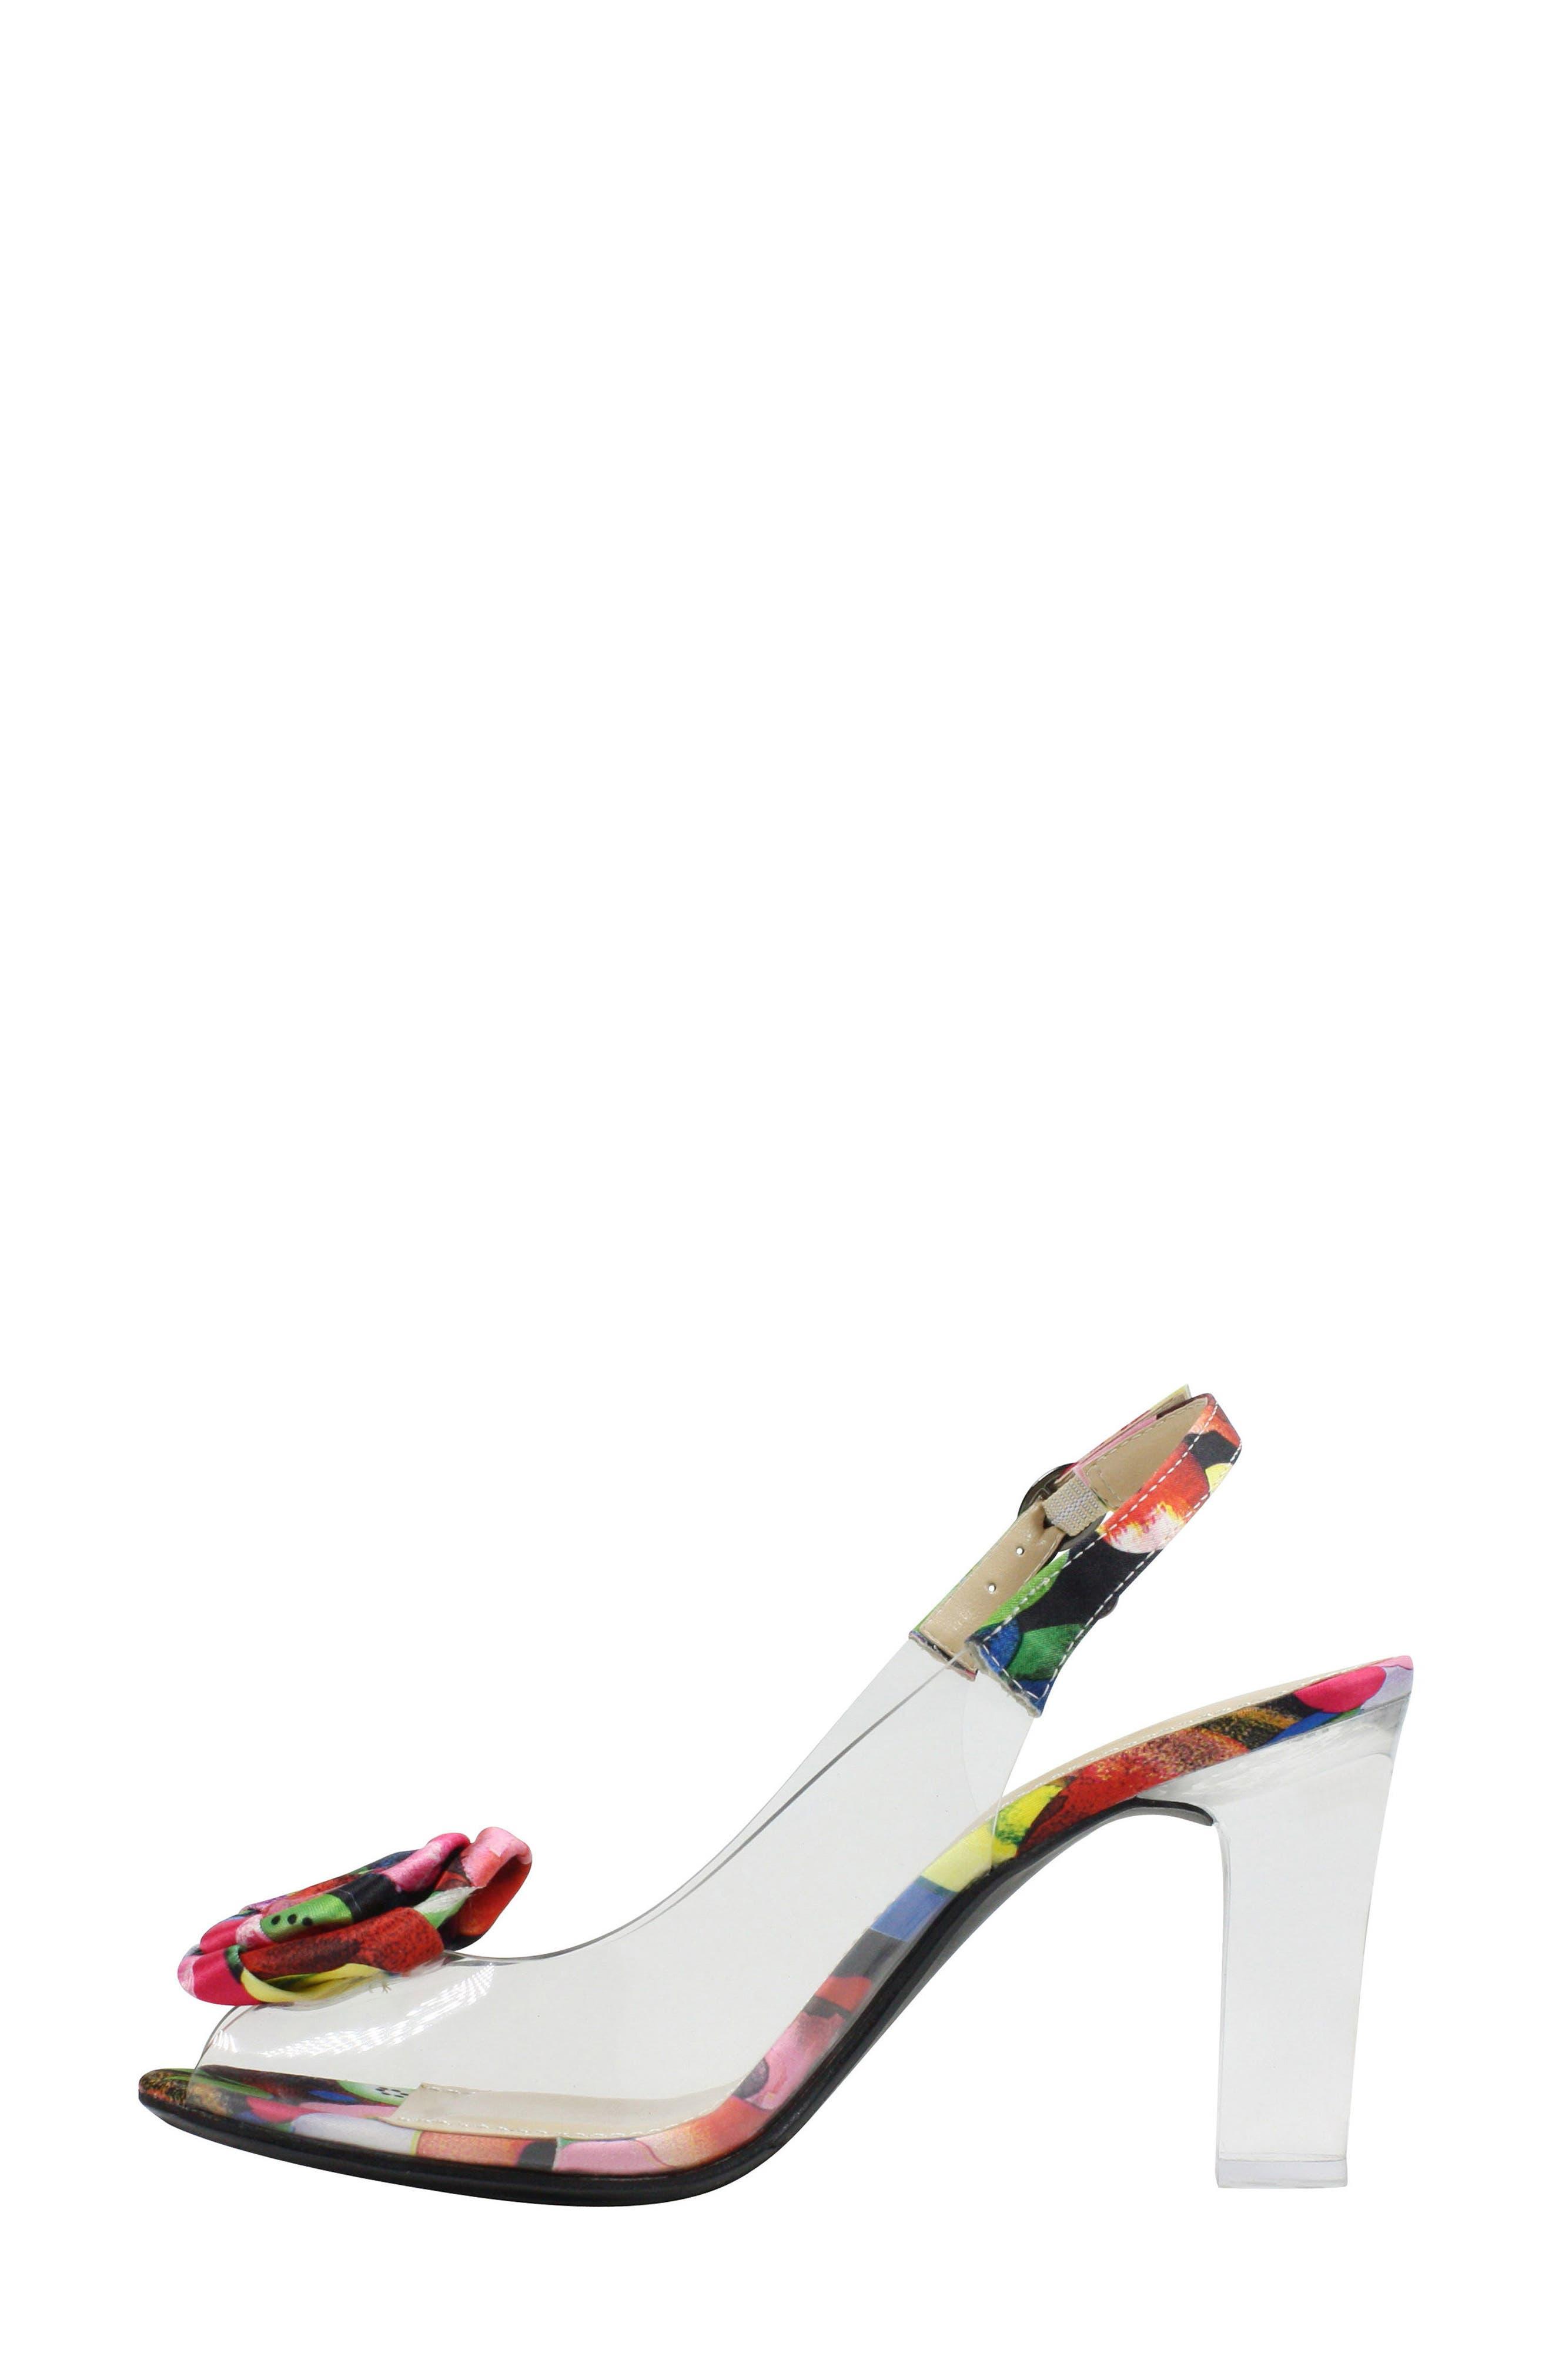 Adoracion Slingback Sandal,                             Alternate thumbnail 4, color,                             Clear/ Black/ Black